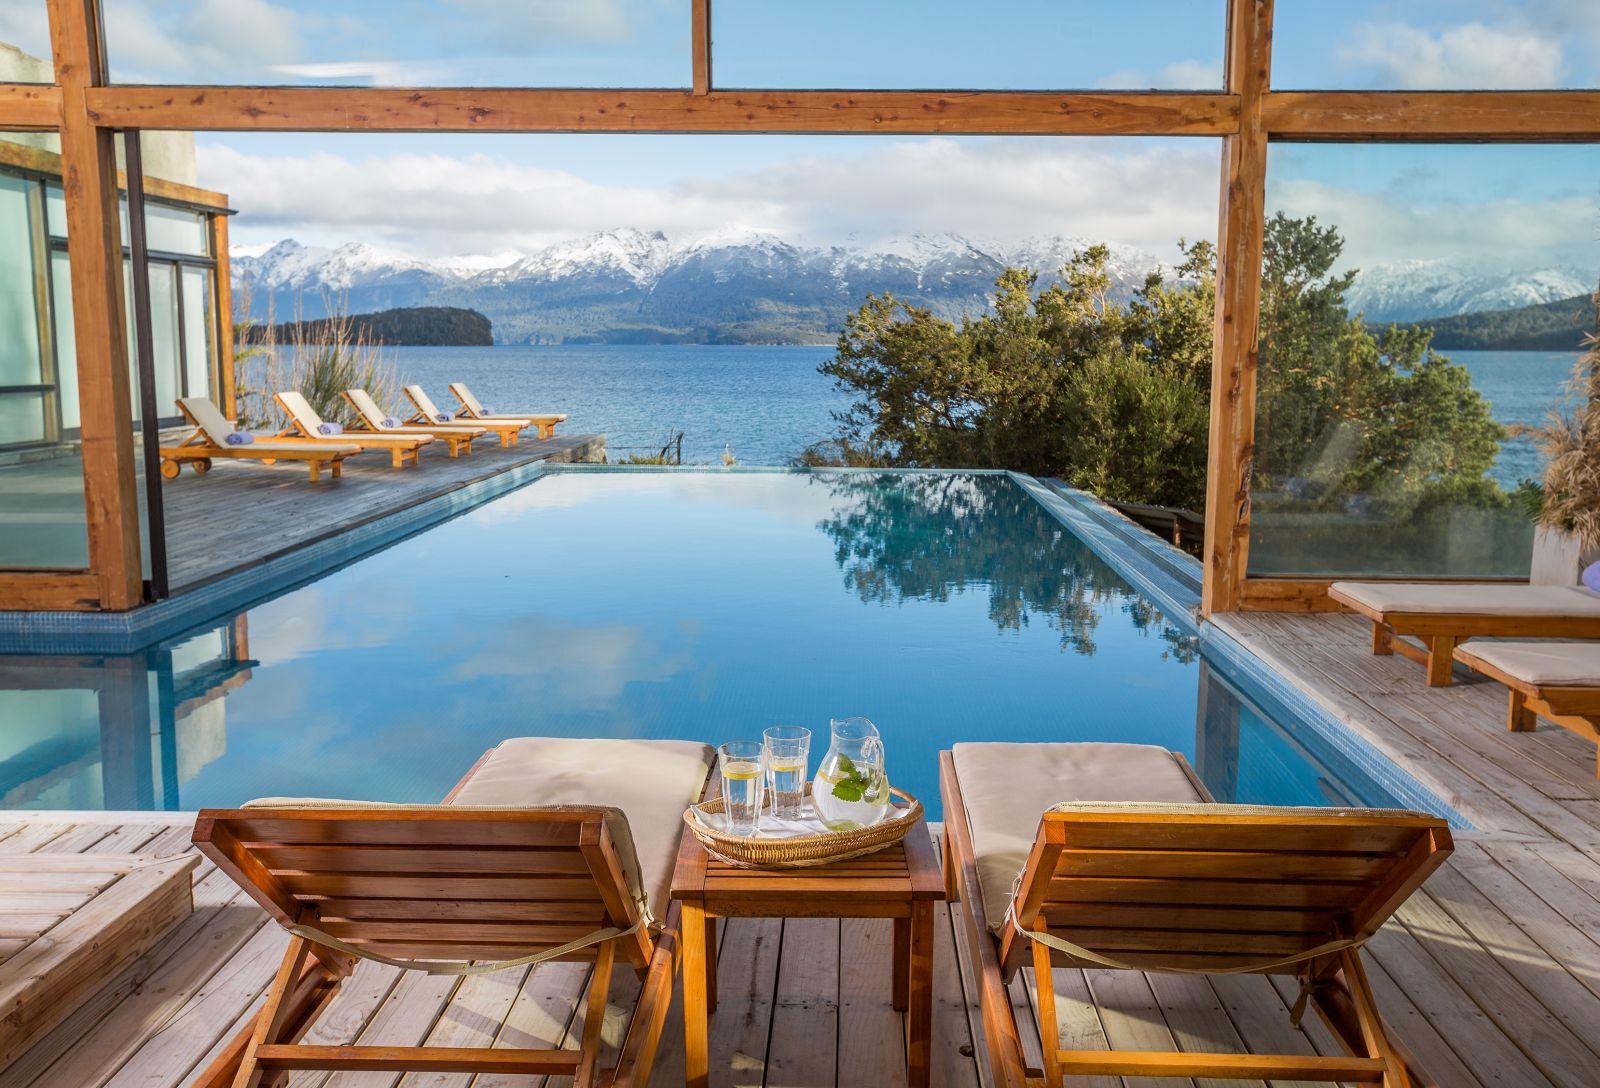 Correntoso Lake & River Hotel